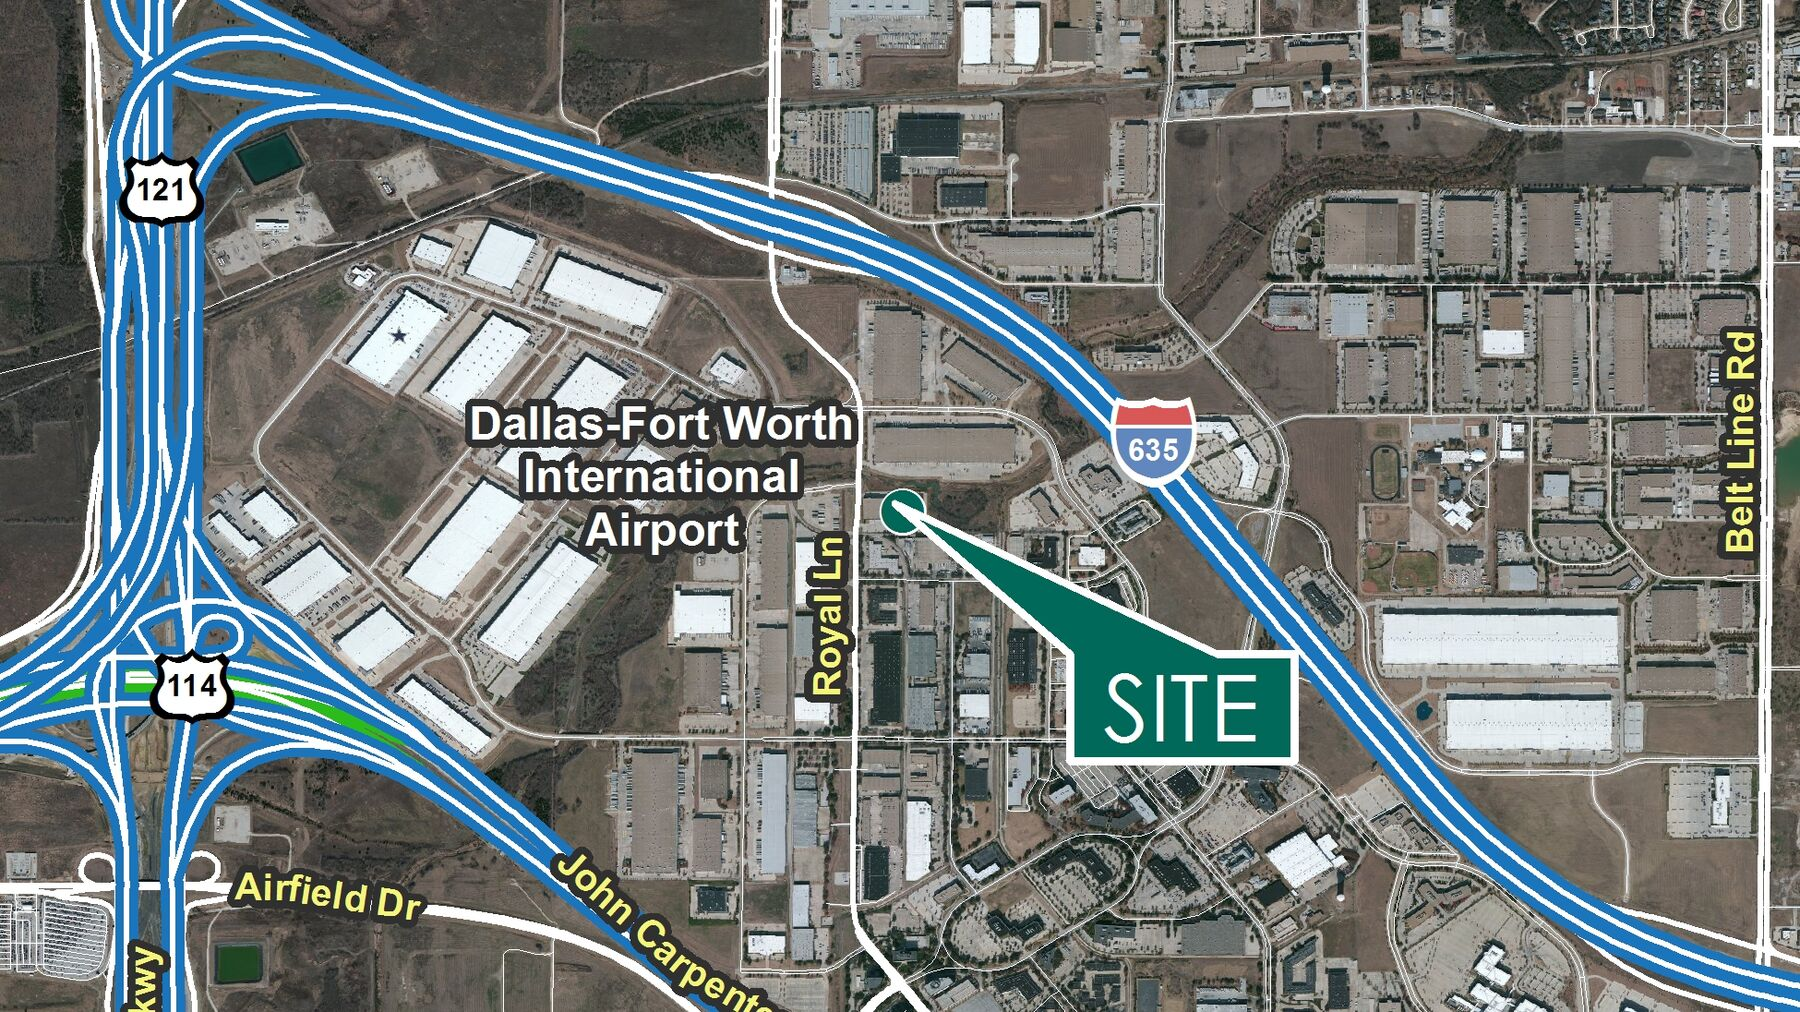 DPM-Prologis-Freeport-Corp-Ctr-4-DAL01304-9250-N-Royal-Lane_AerialMap.jpg